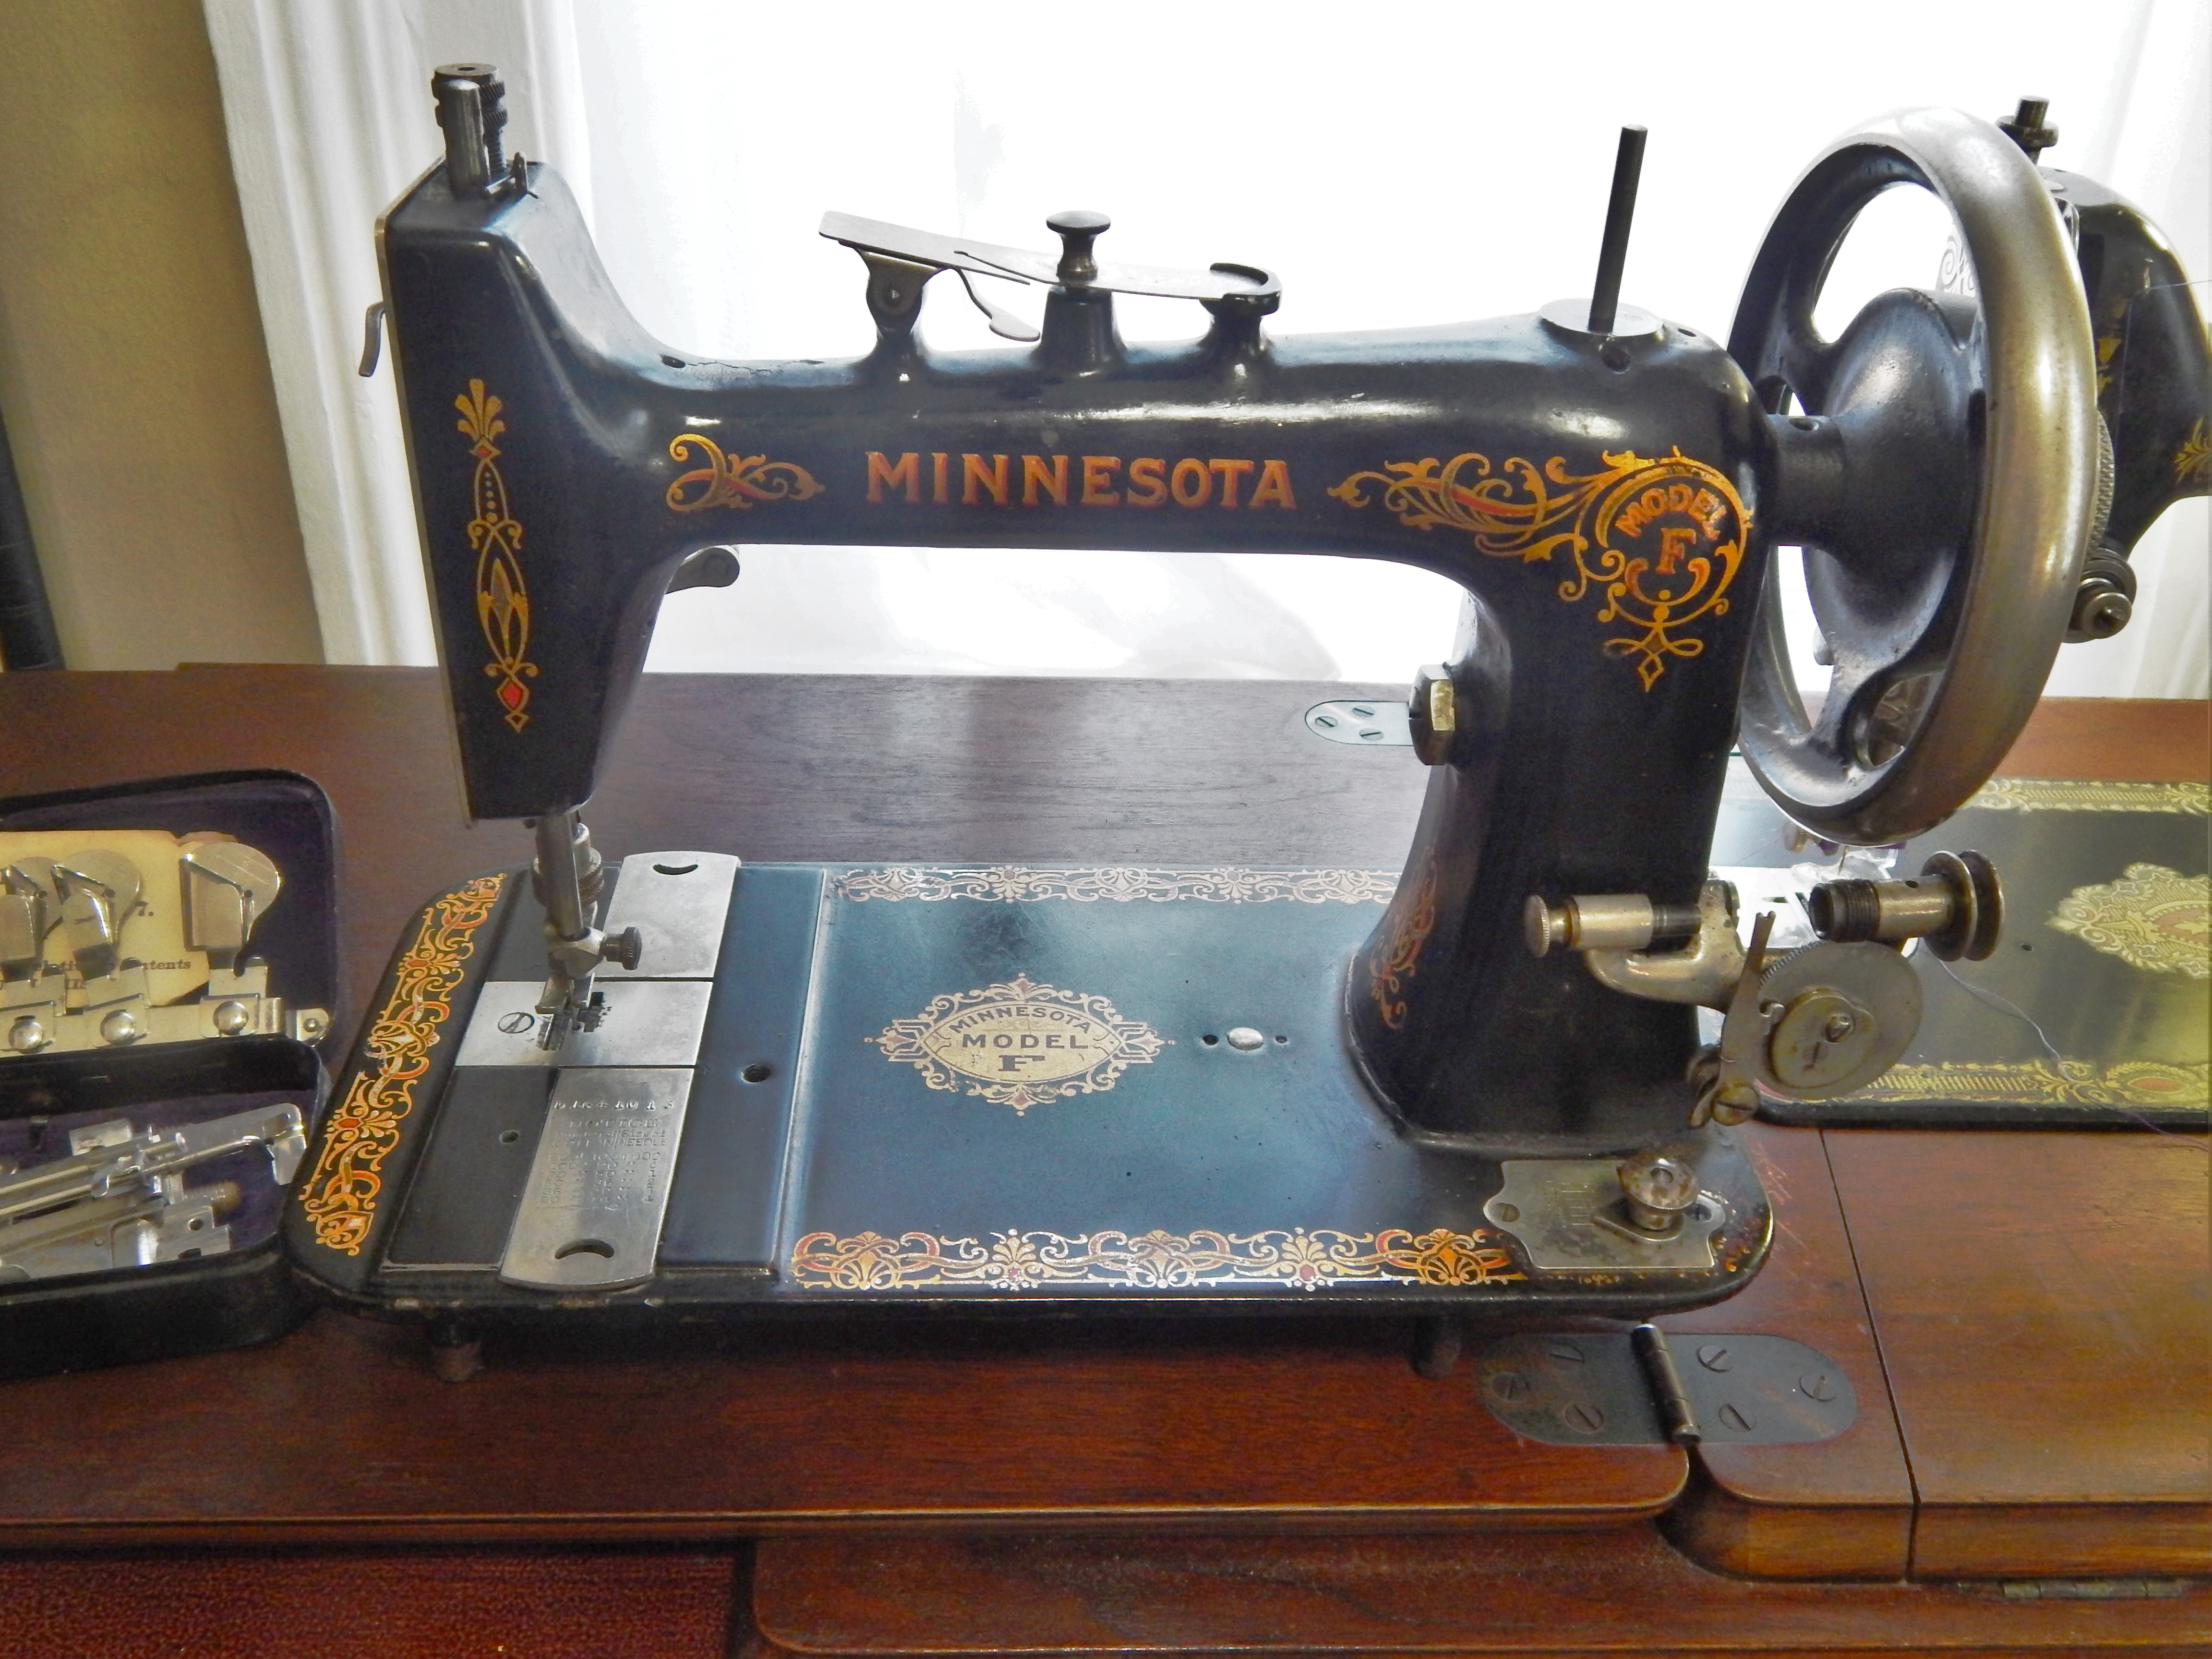 Shapely Minnesota Sewing Machine Tim Latimer Quilts Etc Sears Kenmore Sewing Machine Model 385 Sears Kenmore Sewing Machine 385 houzz-02 Sears Kenmore Sewing Machine